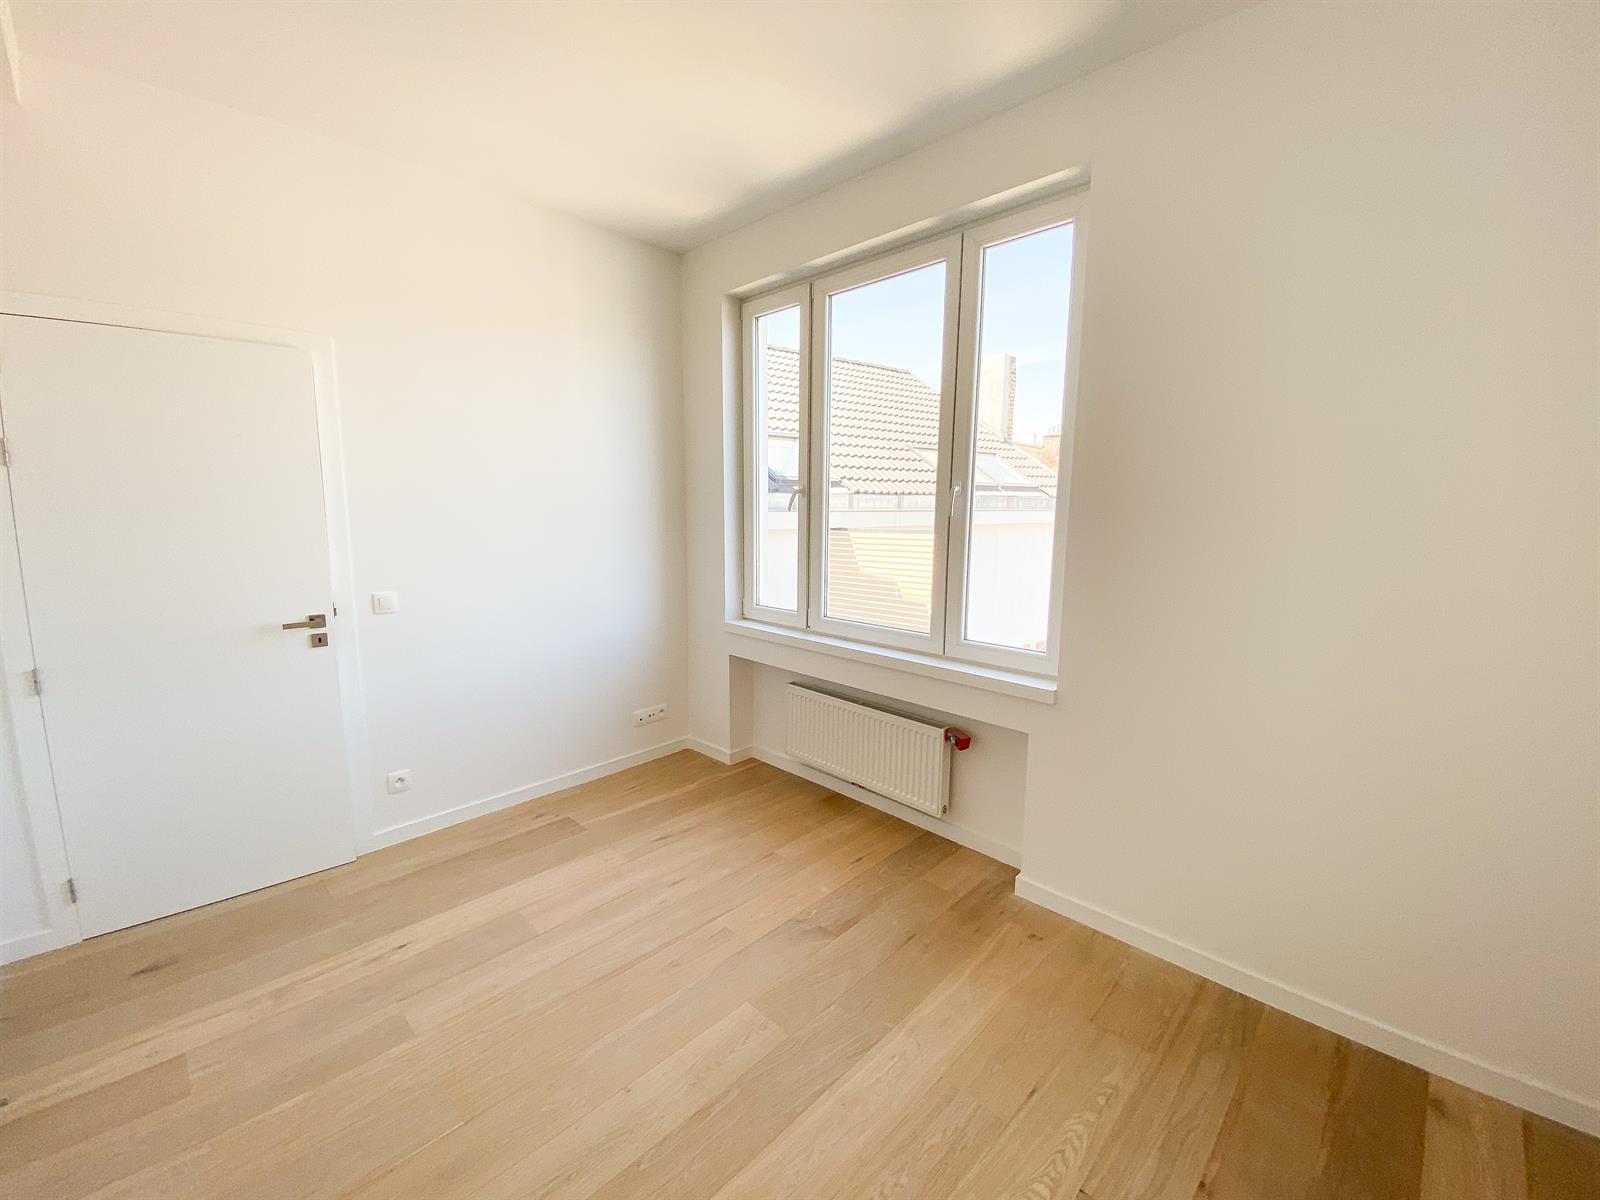 Appartement - Liège - #4045826-10